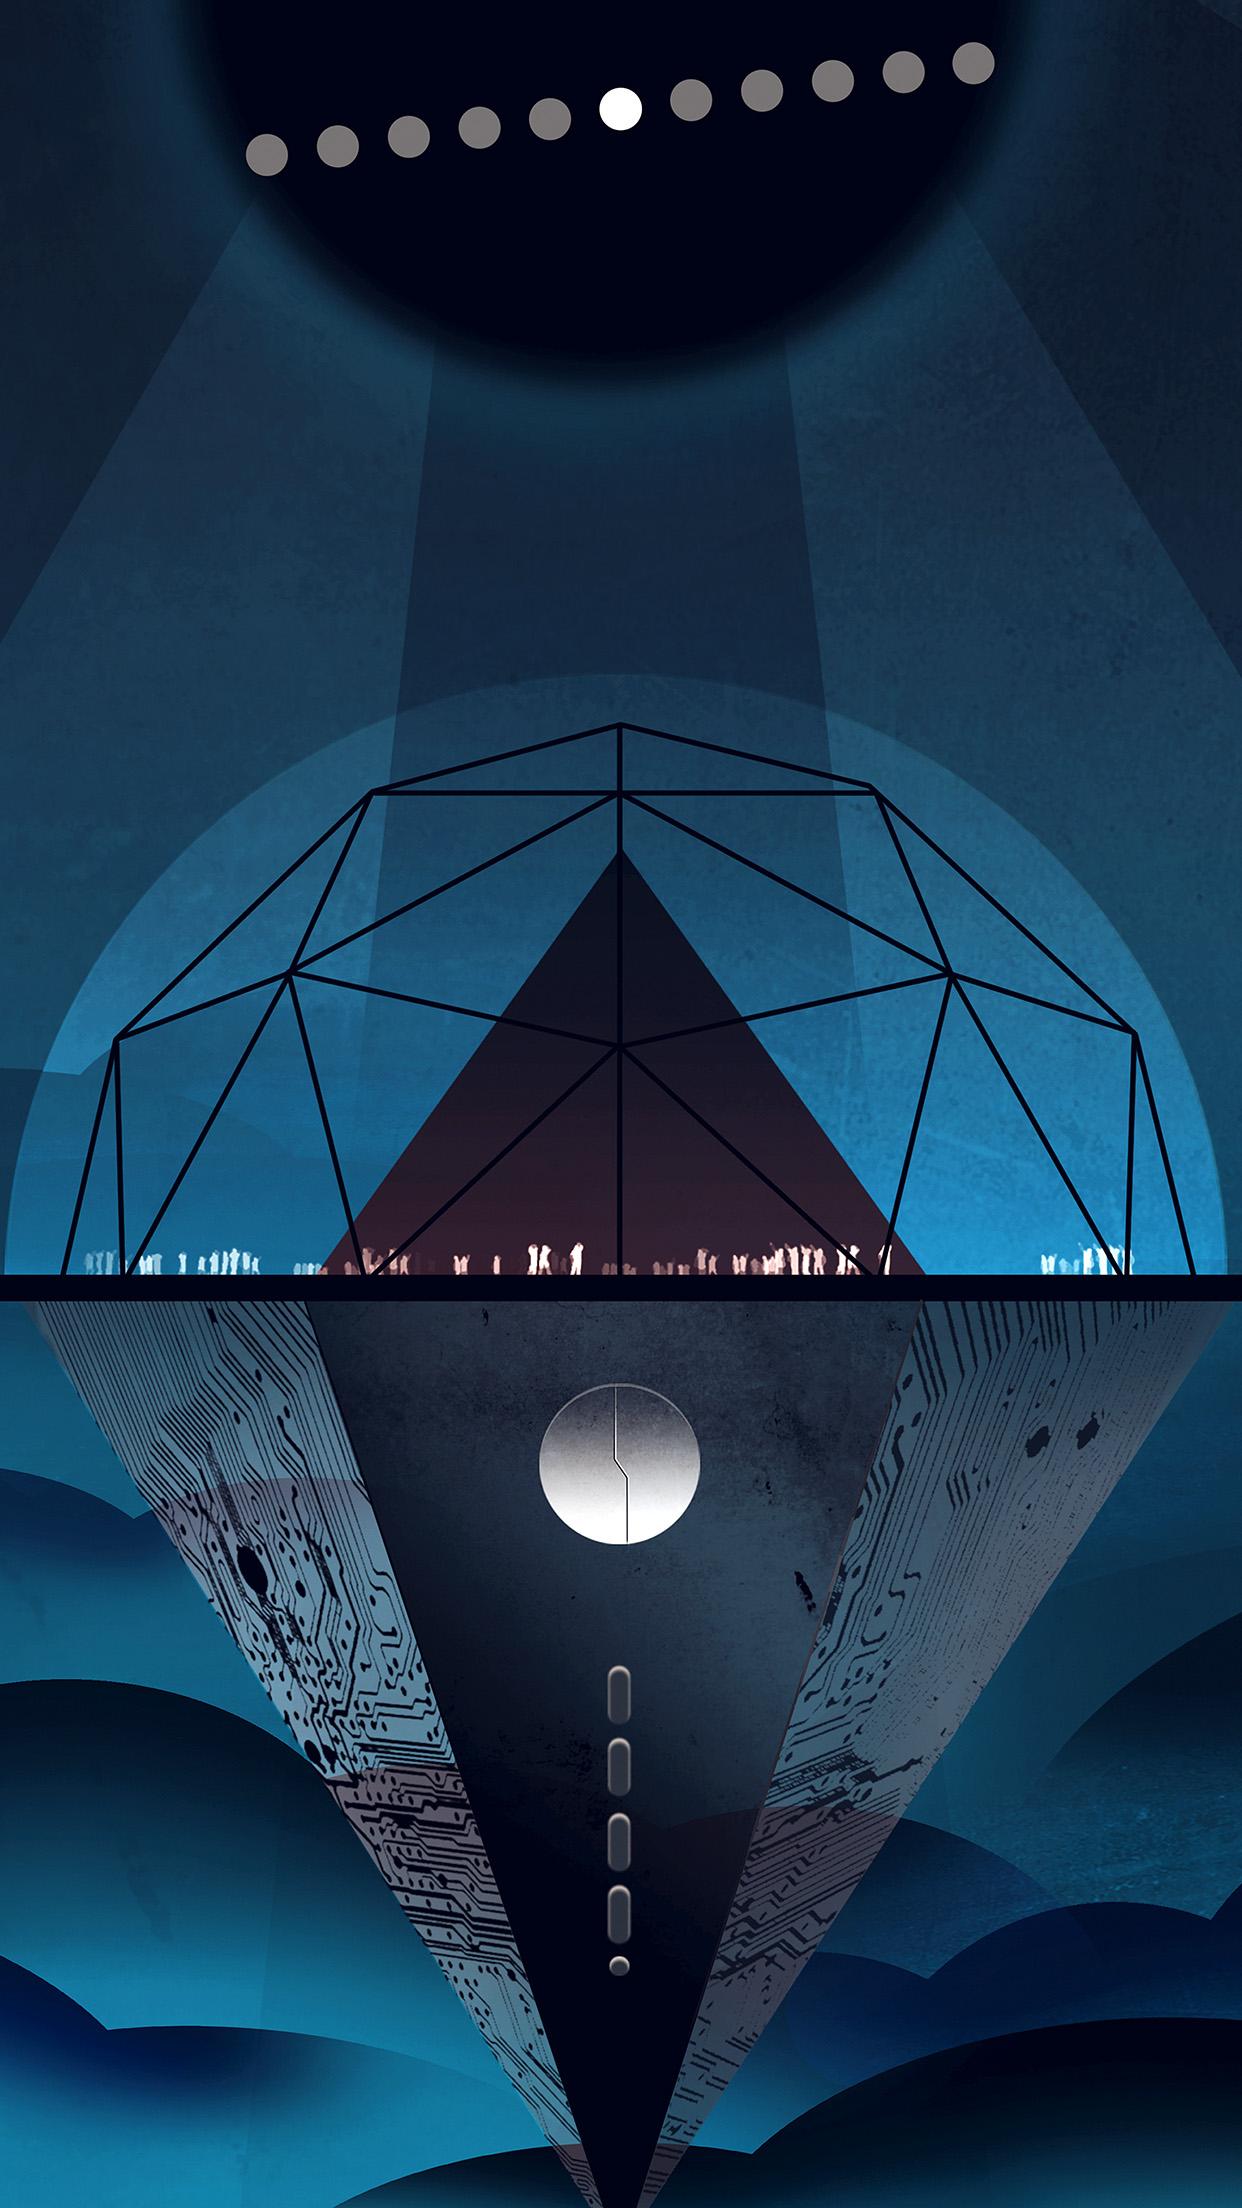 venus dark blue art illustration nasa space android